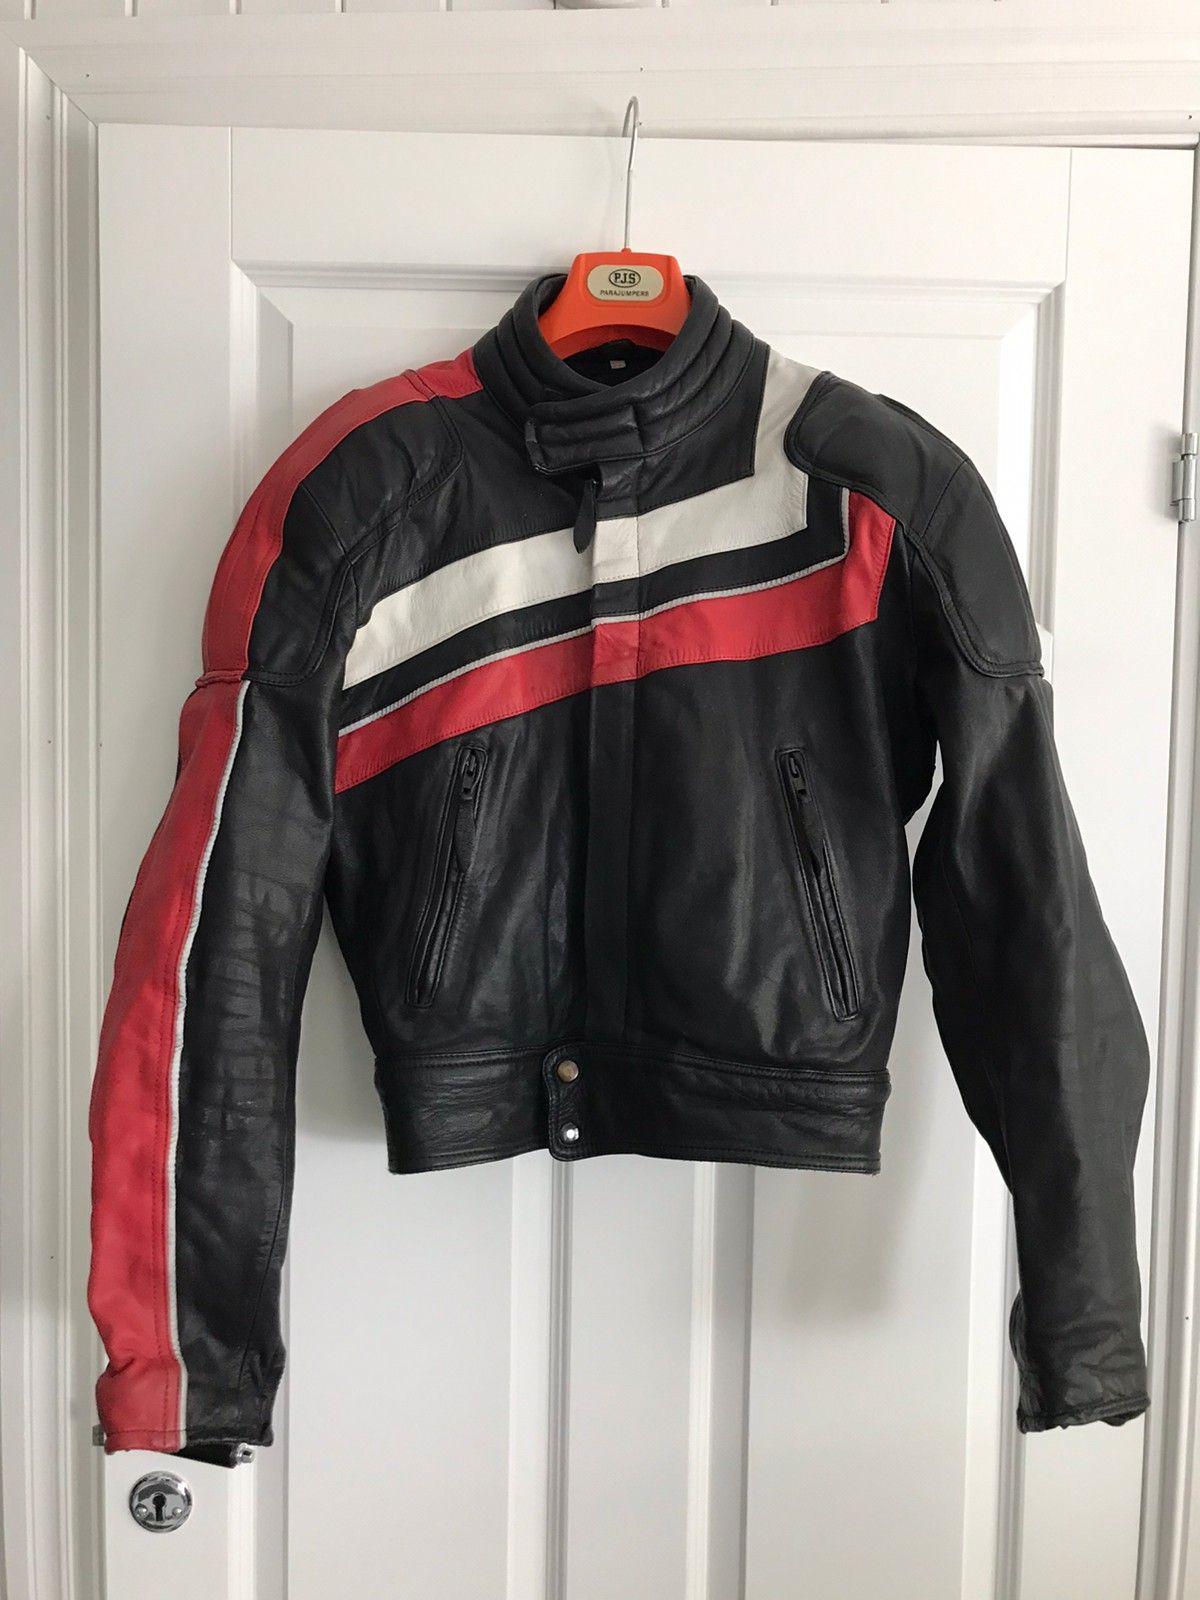 MC jakke til salgs | FINN.no